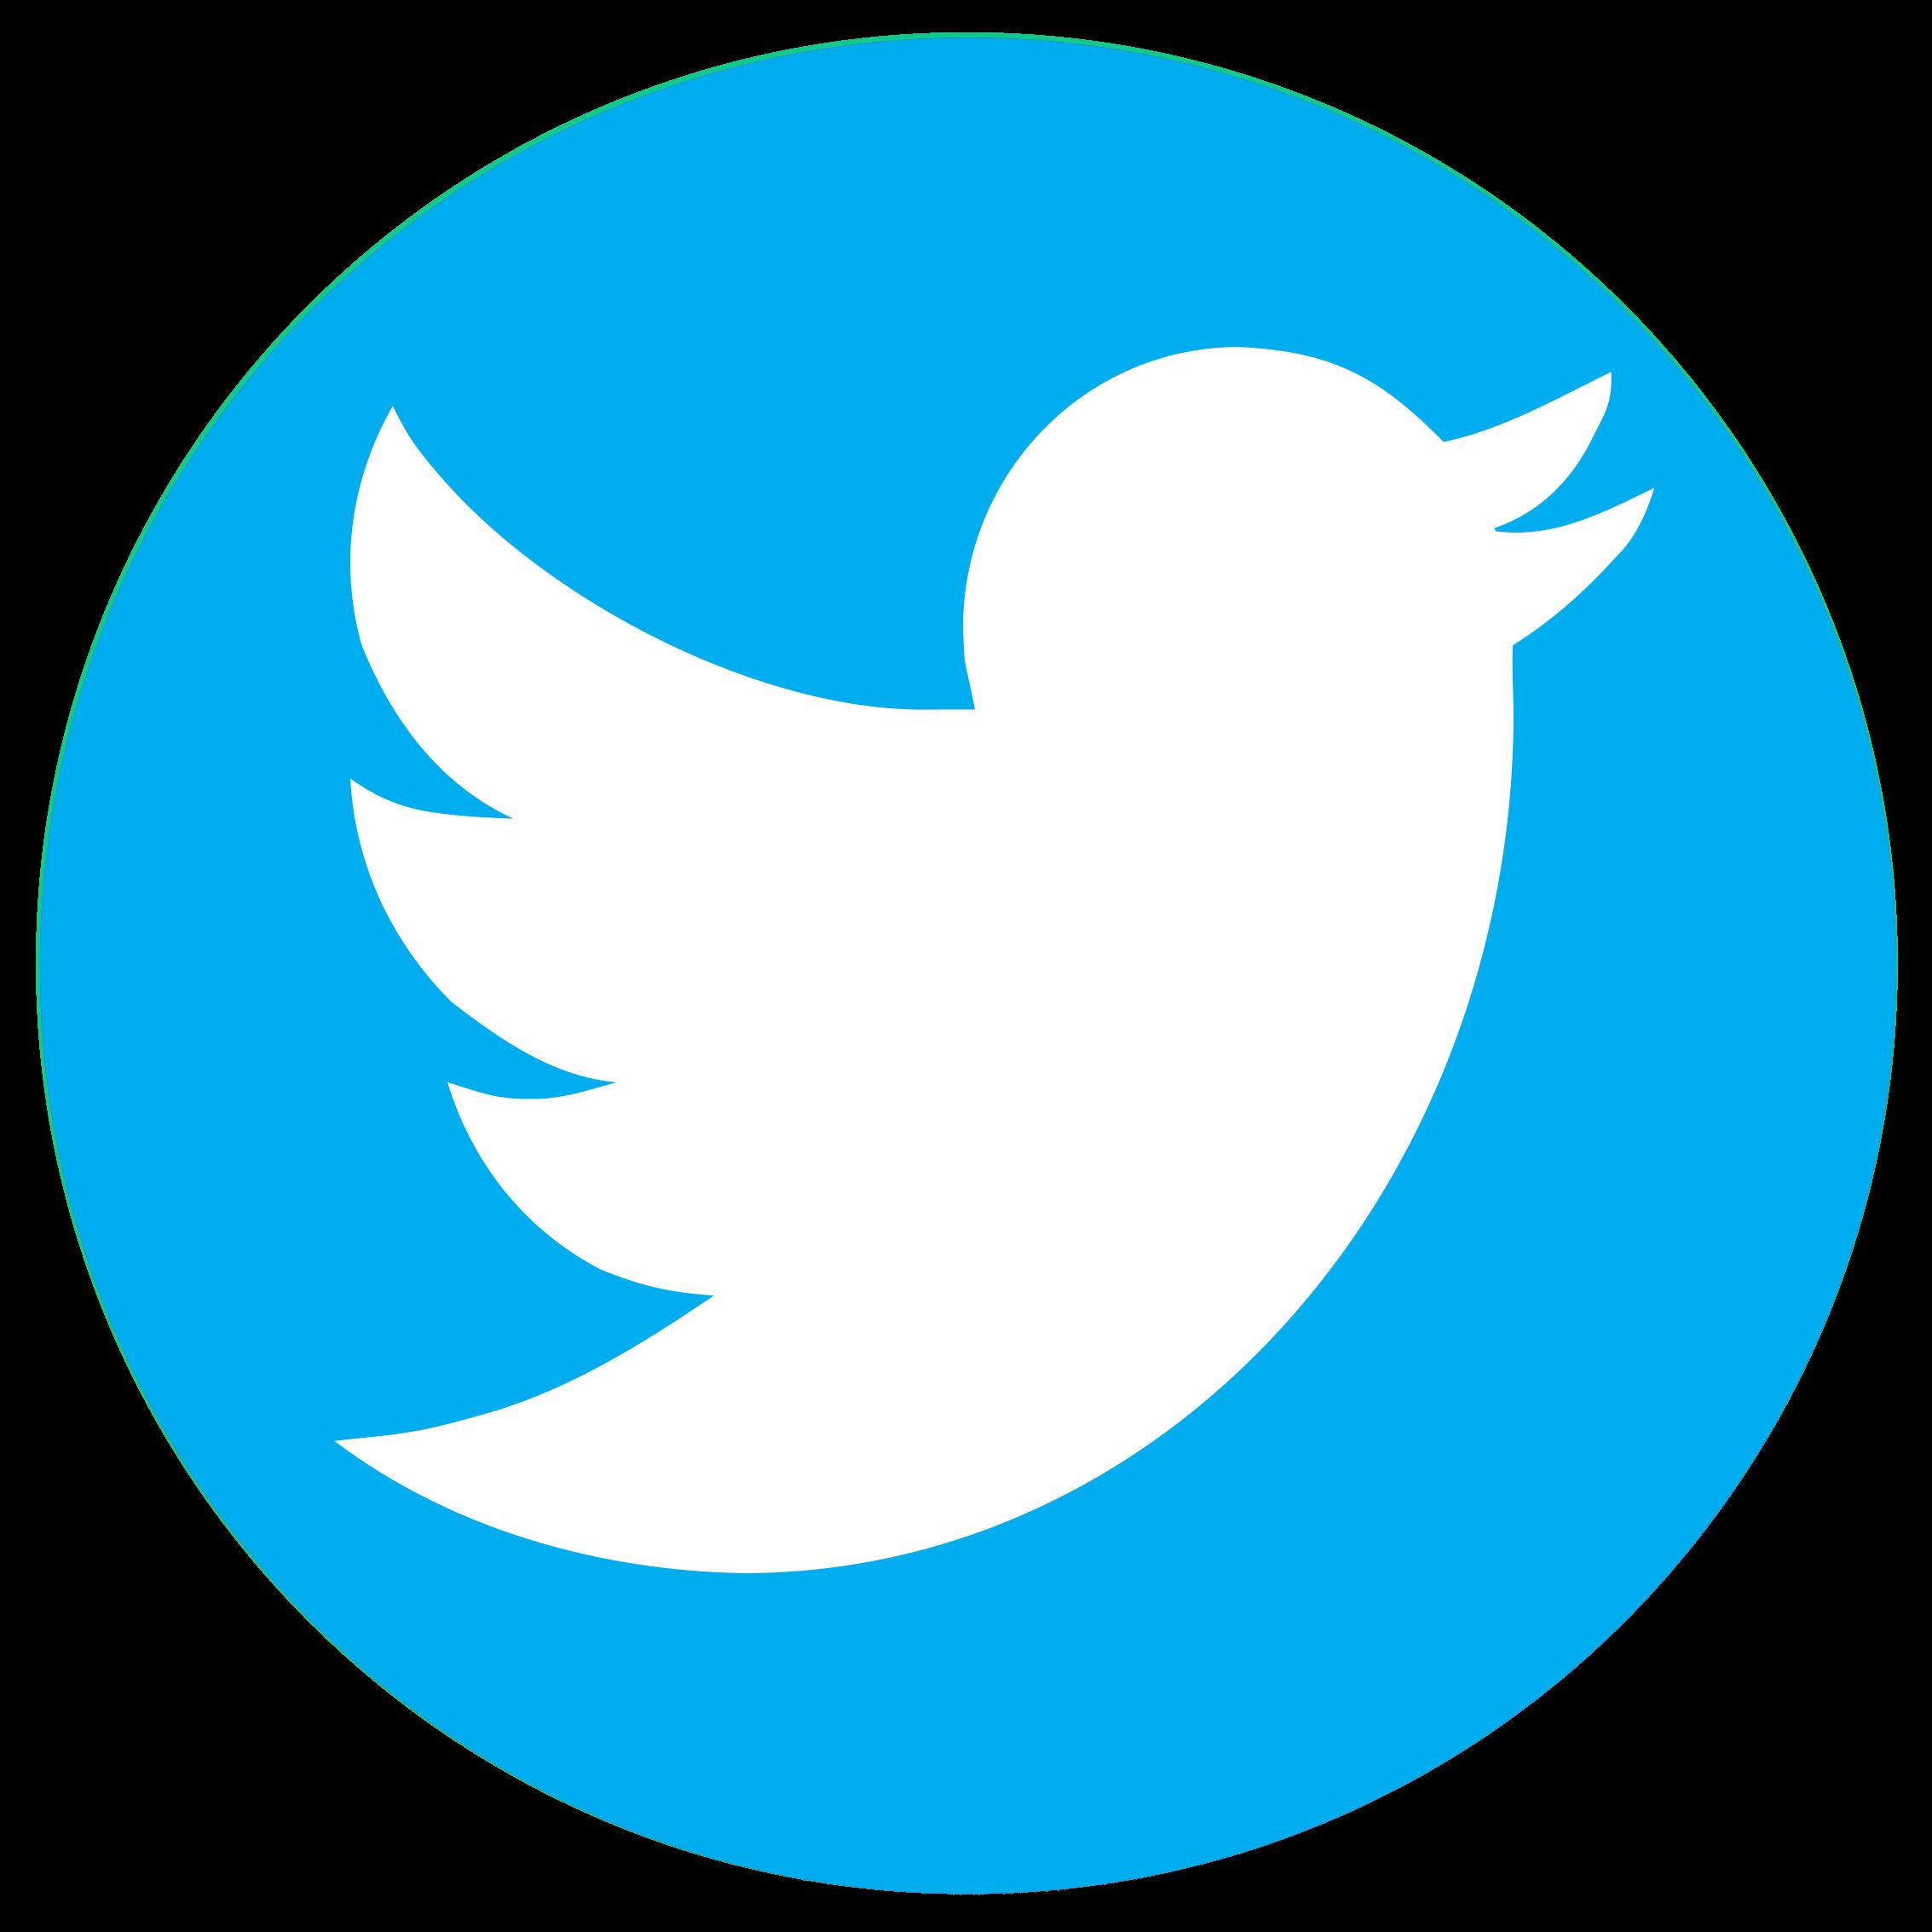 logo-rond-twitter - Danone Institute